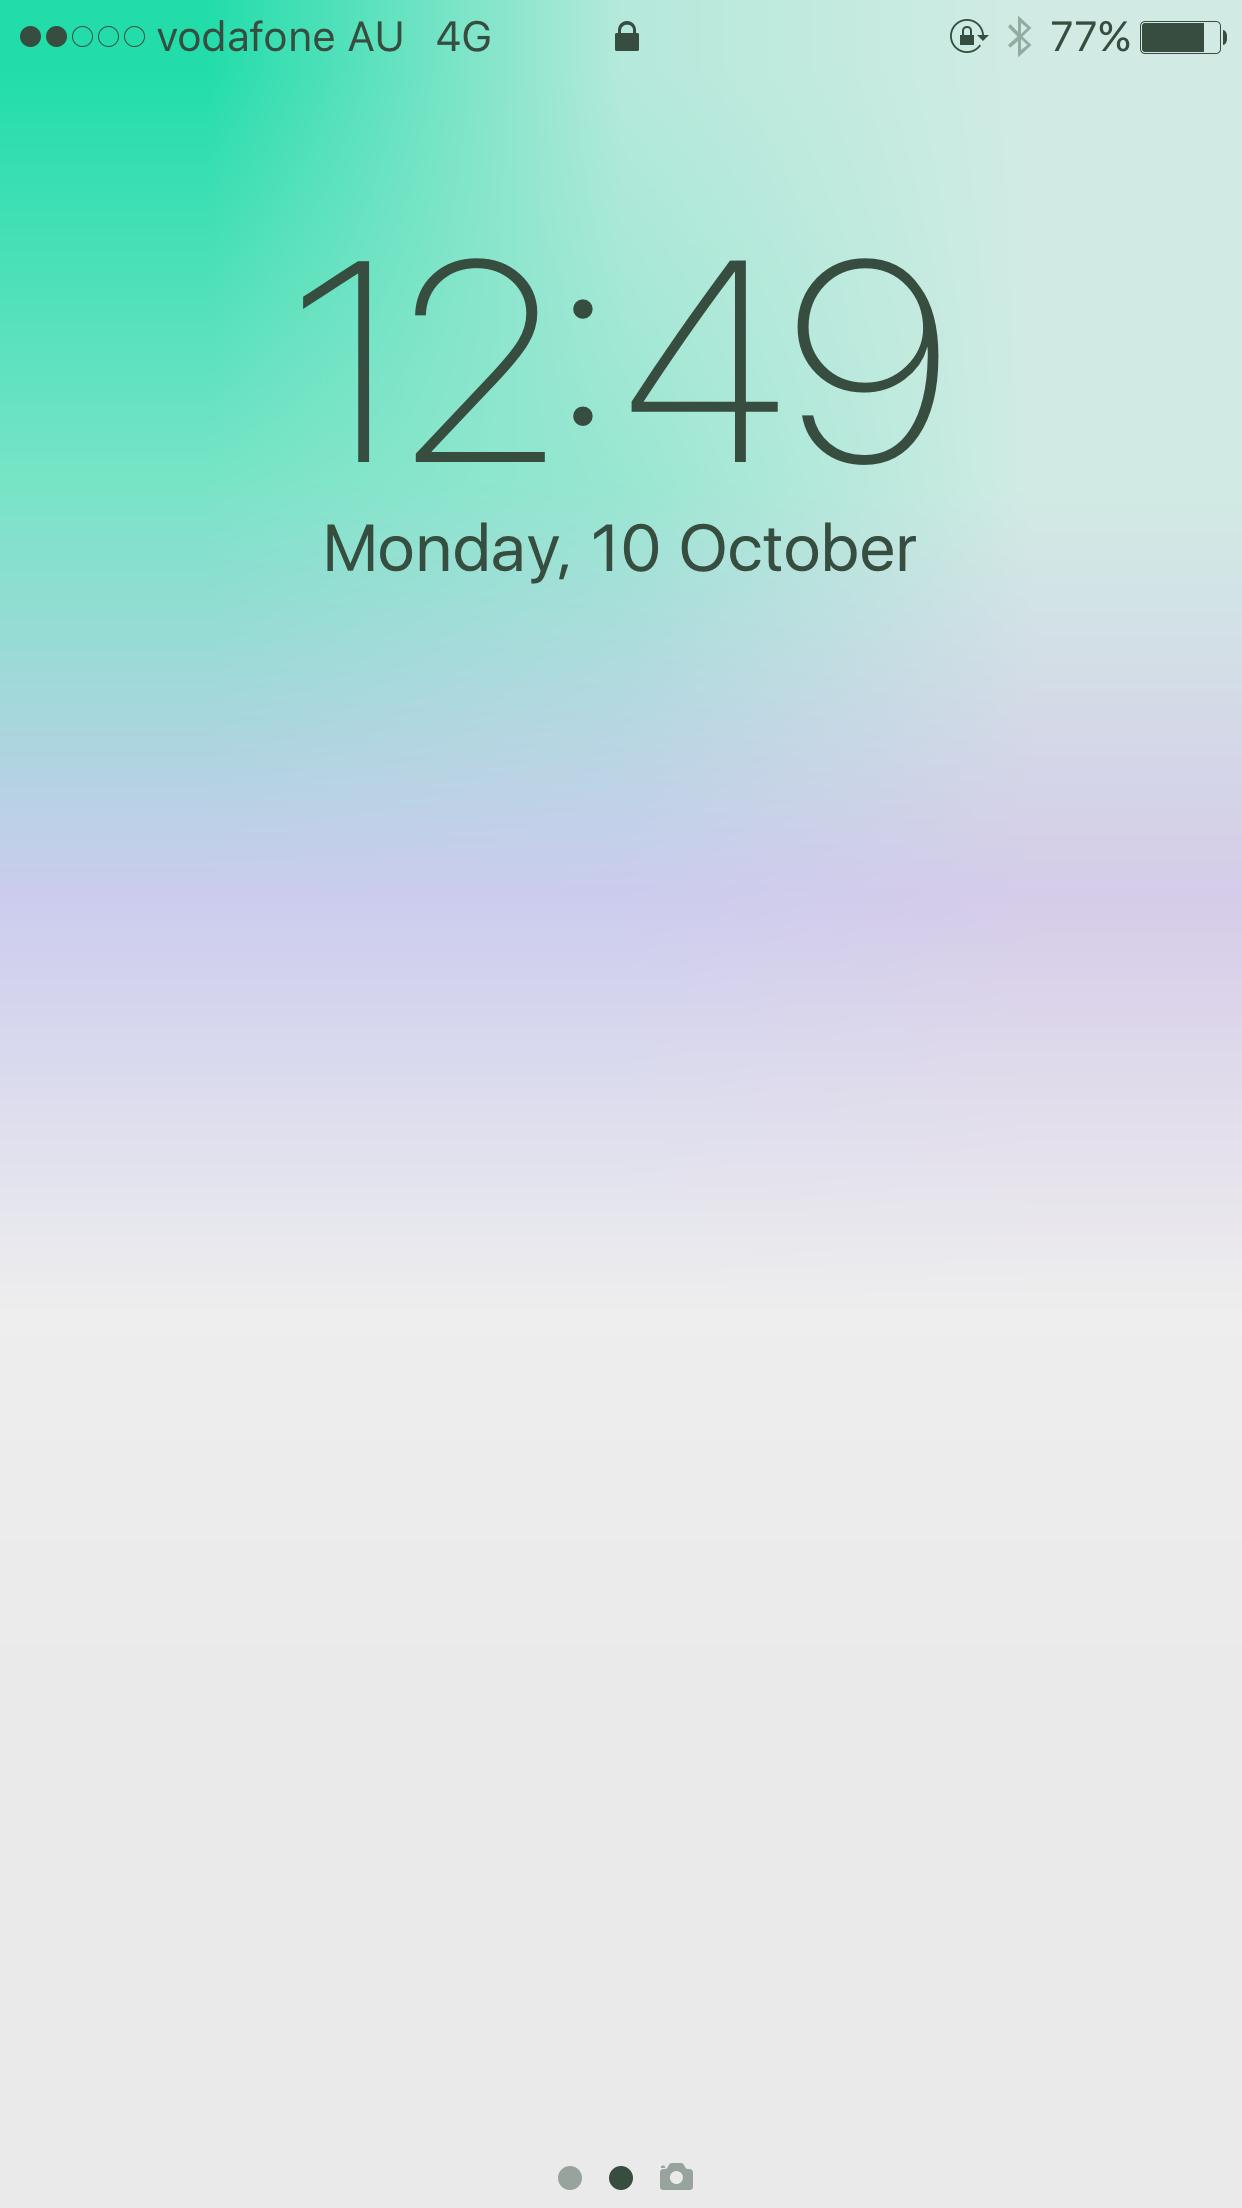 Wallpaper iphone hide dock - Wss2rrs Imgur Png Vwuue0d Imgur Png